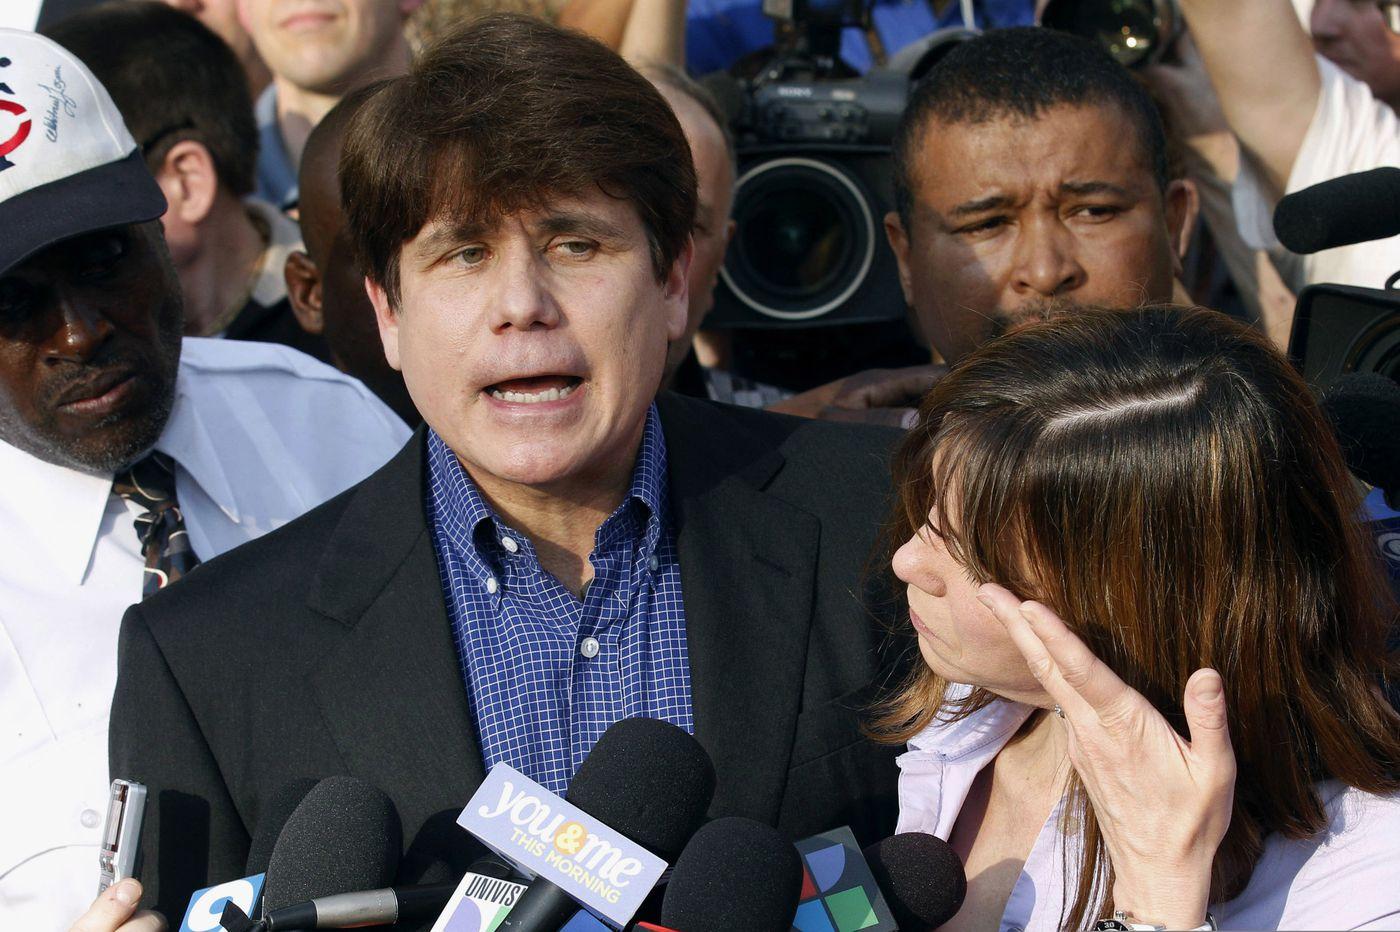 Ex-Gov. Blagojevich returns to Chicago after Trump pardon, maintains innocence